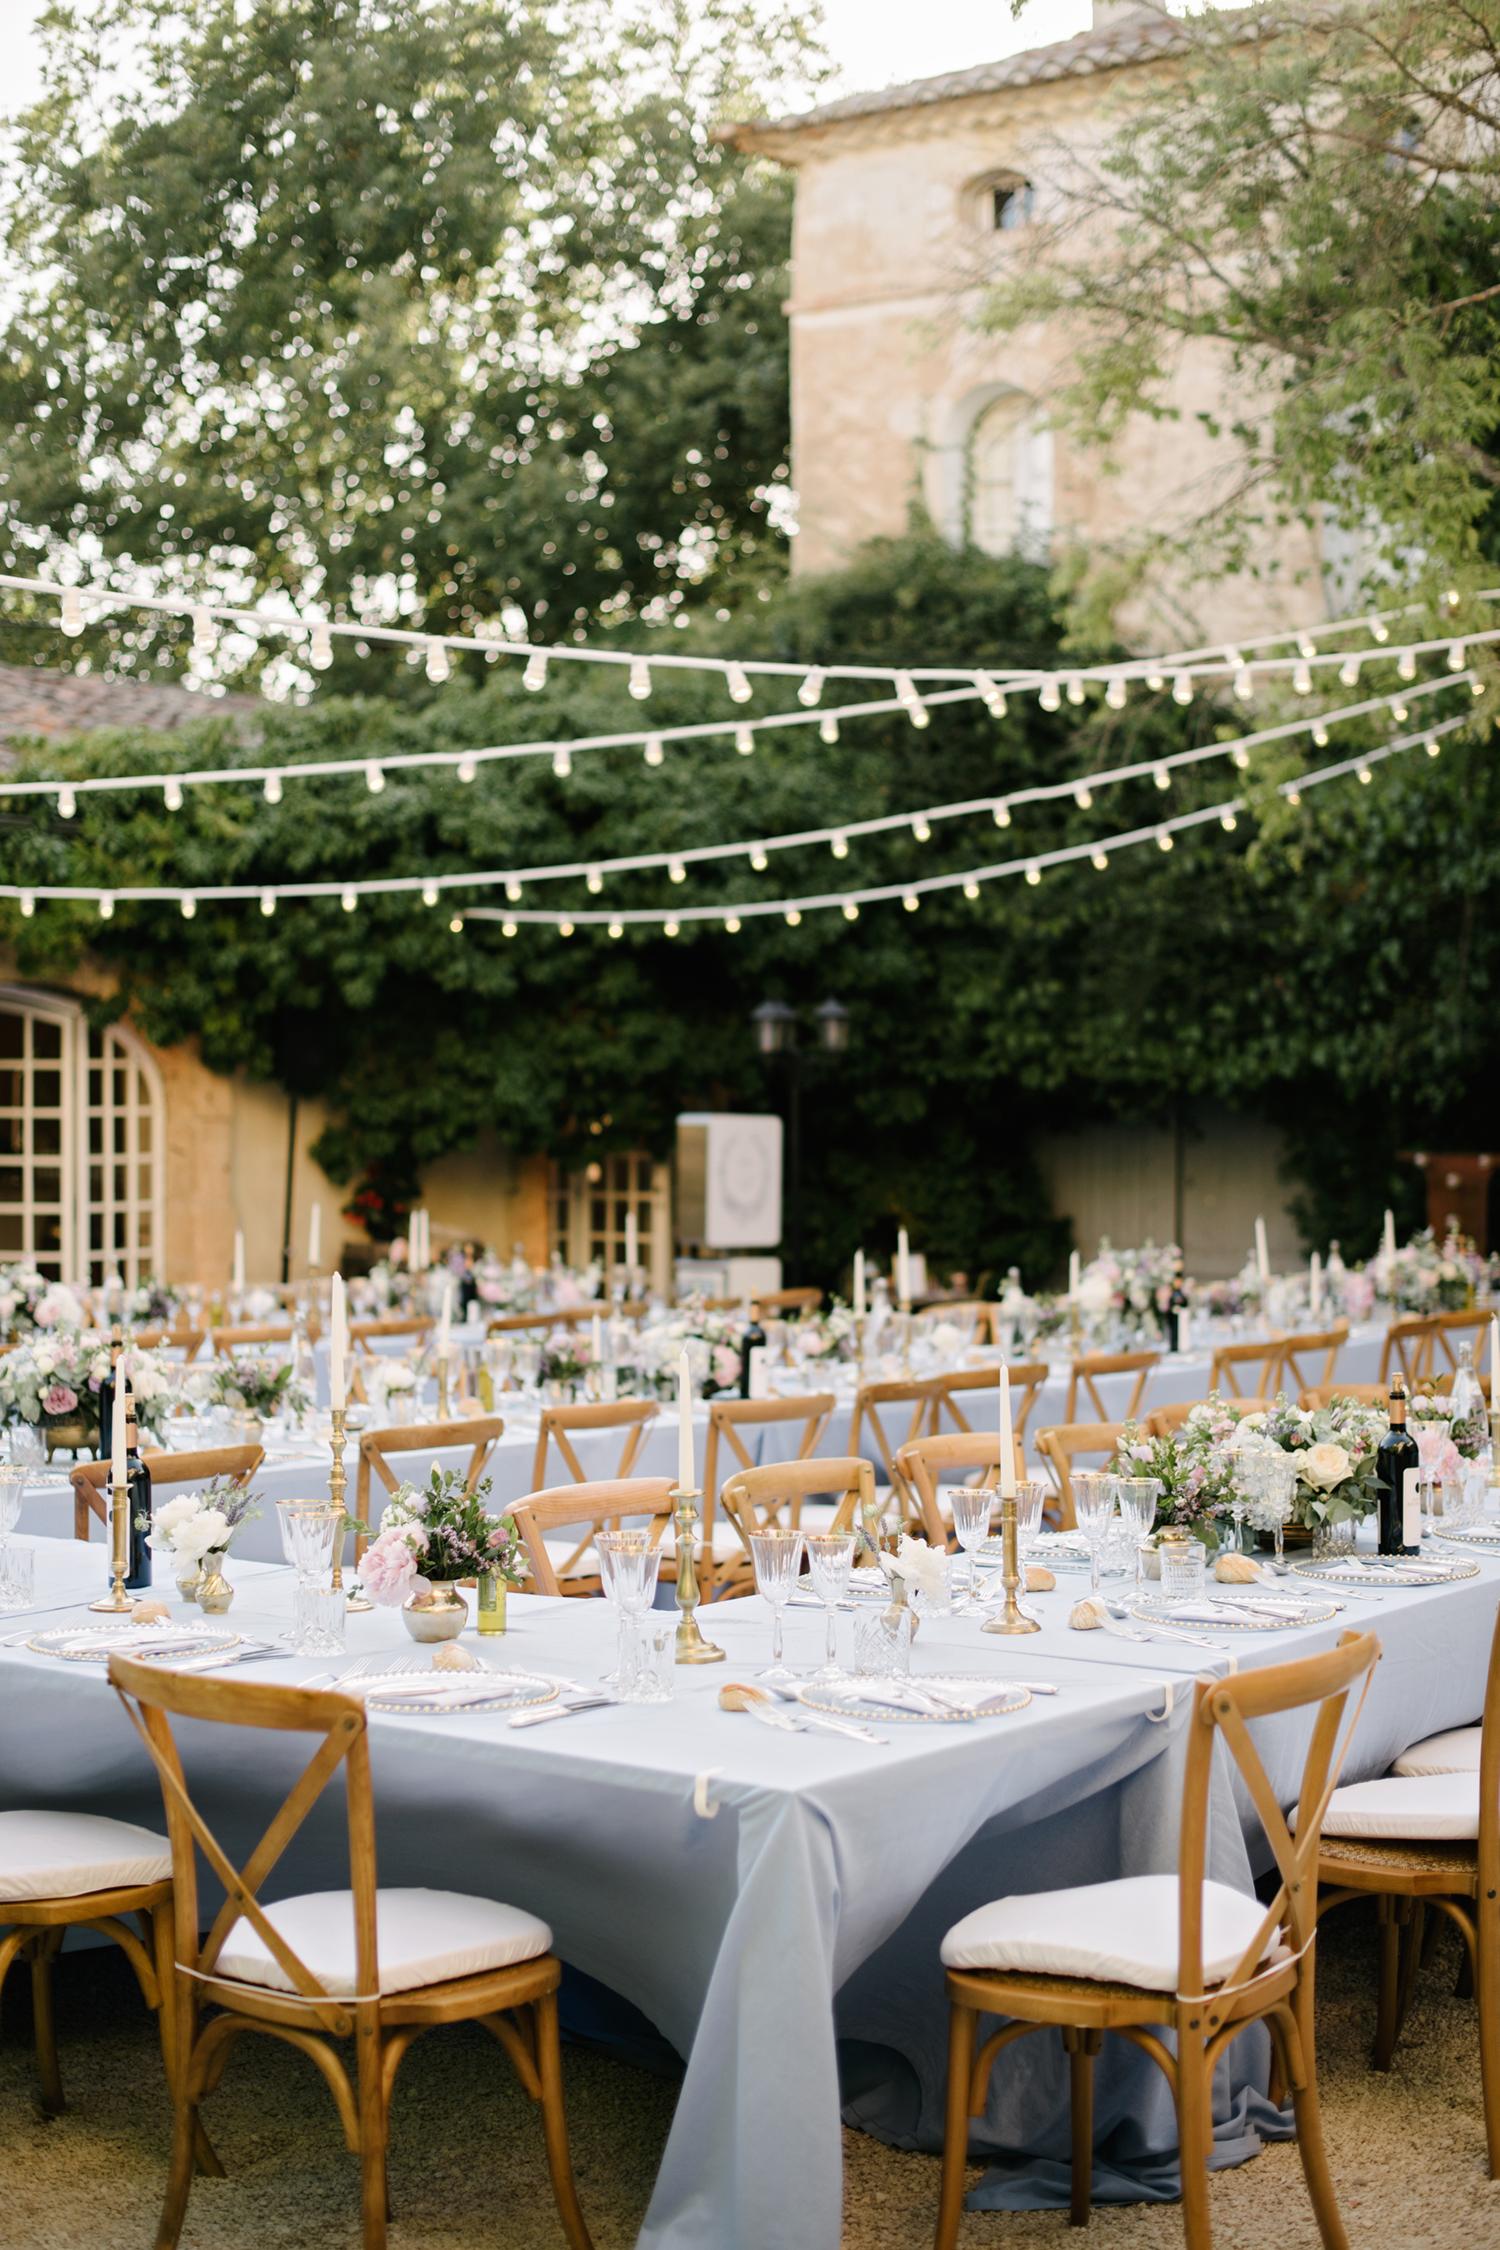 Chateau-Robernier-Wedding-Photographer-0142.jpg